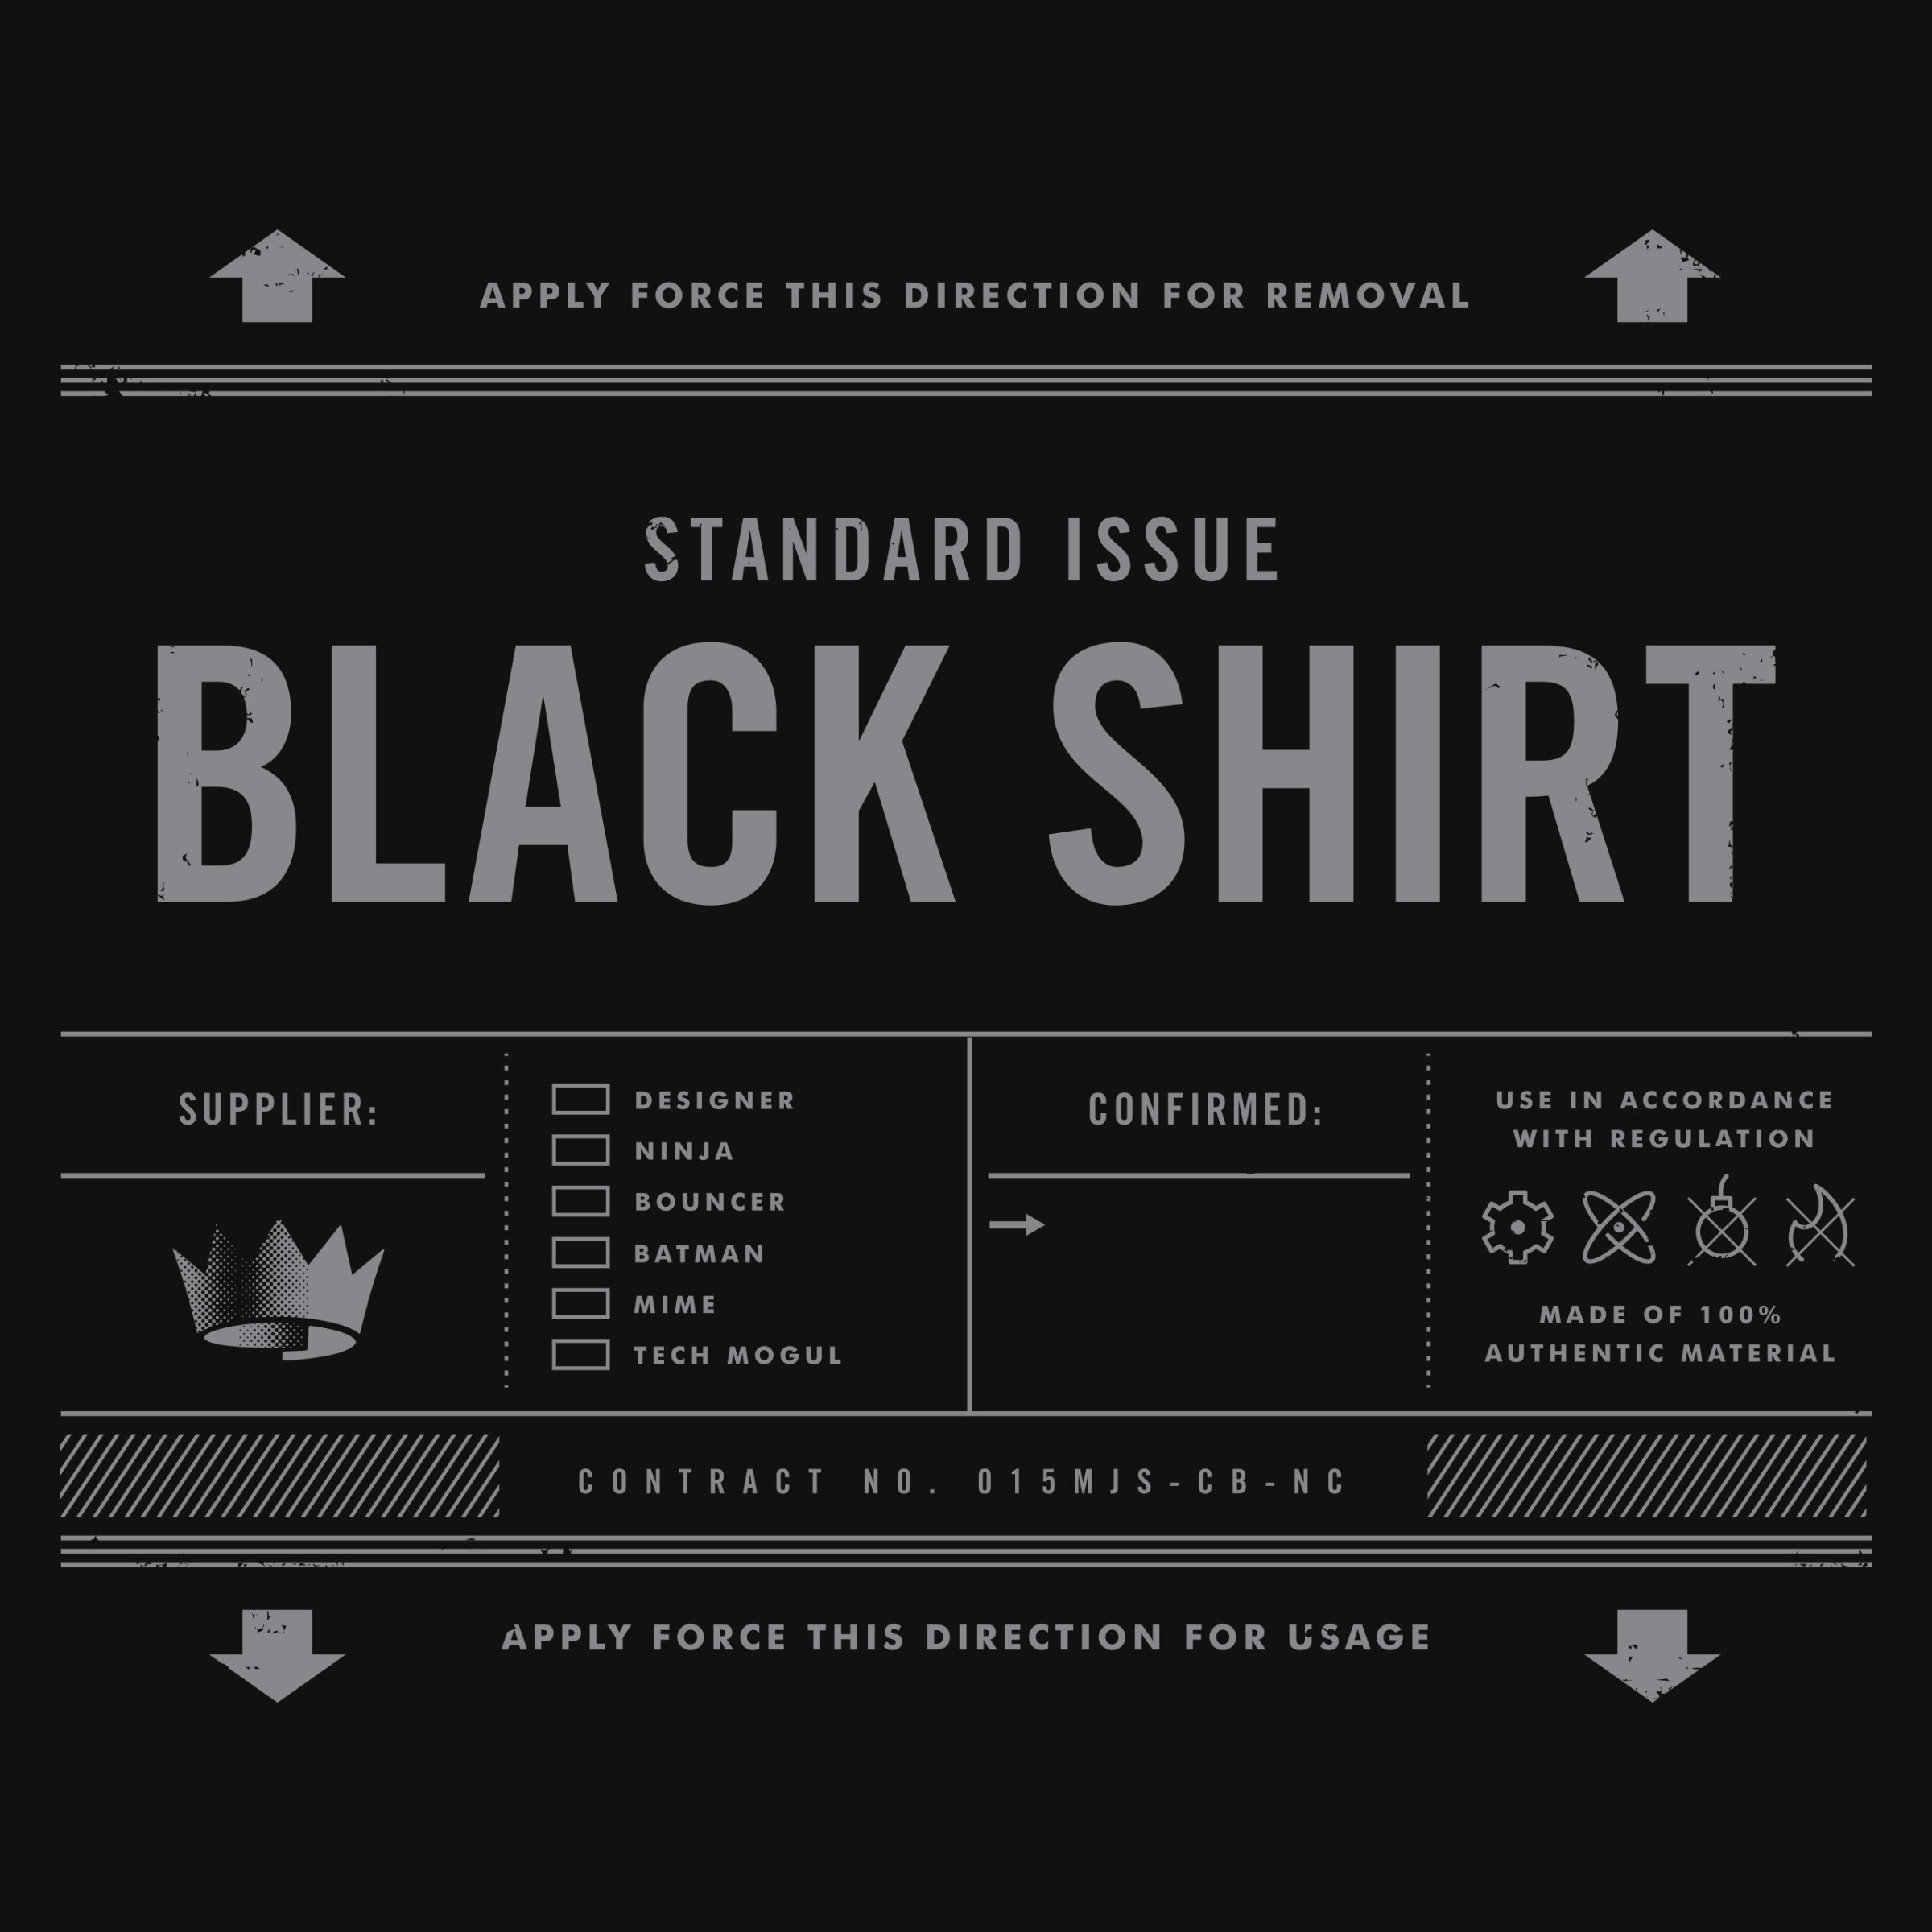 Standard Issue Black Shirt